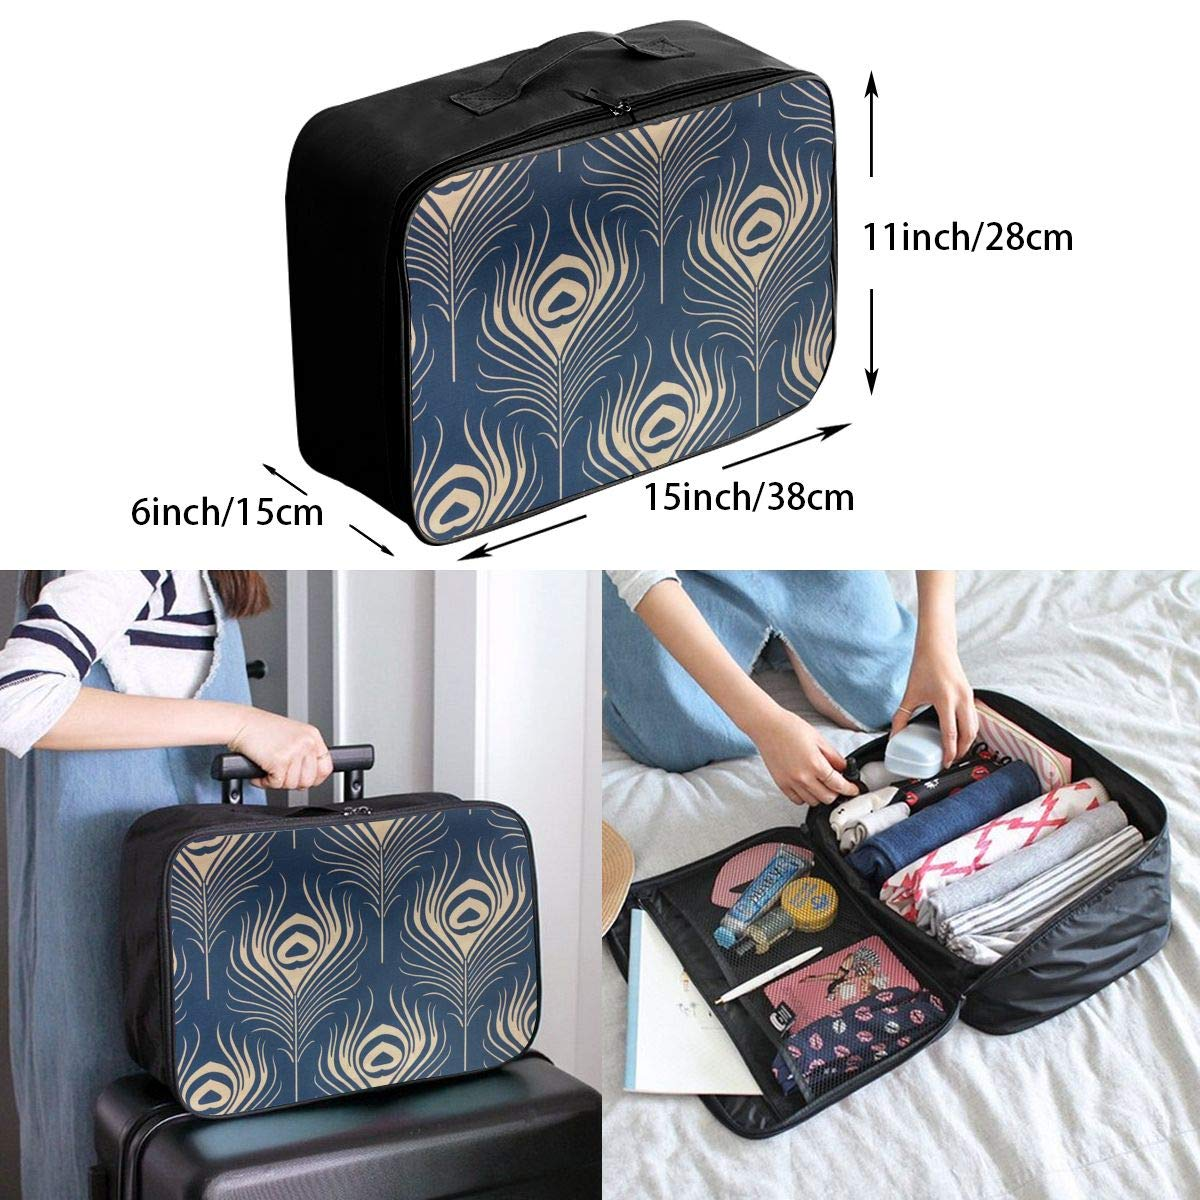 Travel Luggage Duffle Bag Lightweight Portable Handbag Feather Pattern Large Capacity Waterproof Foldable Storage Tote